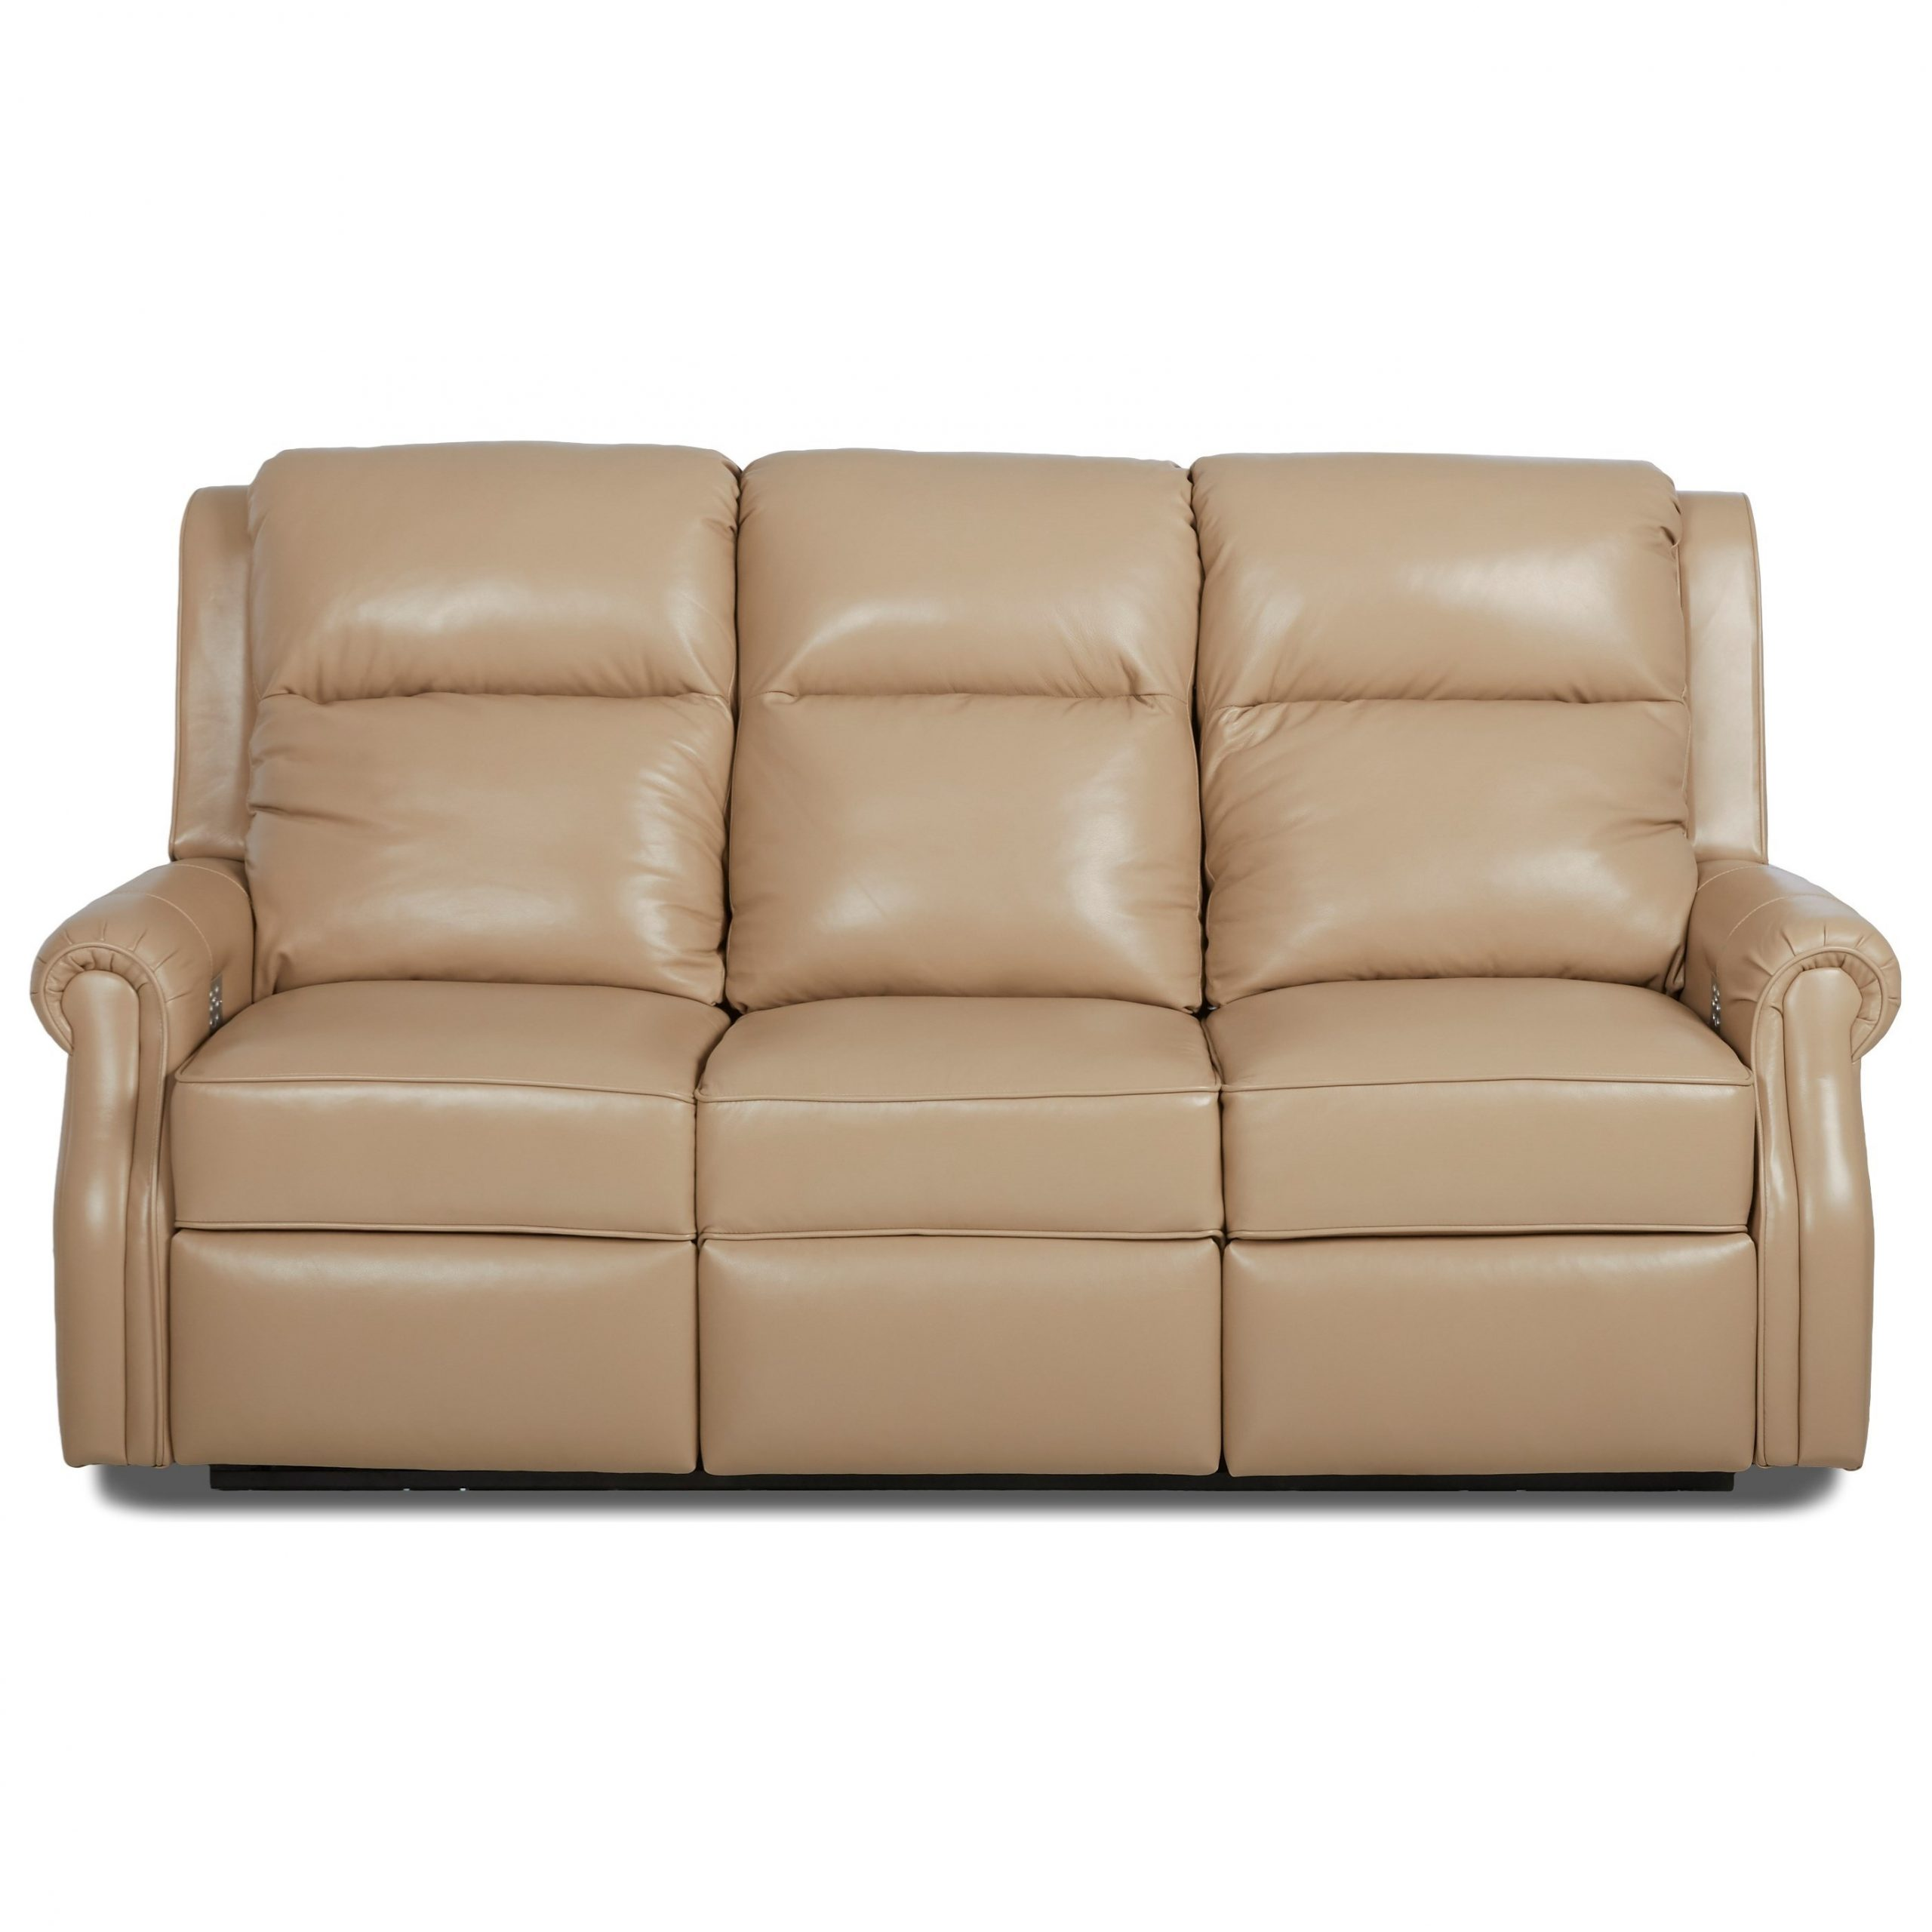 Favorite Charleston Power Reclining Sofas Regarding Comfort Design Jamestown Power Reclining Sofa With Power (View 17 of 20)